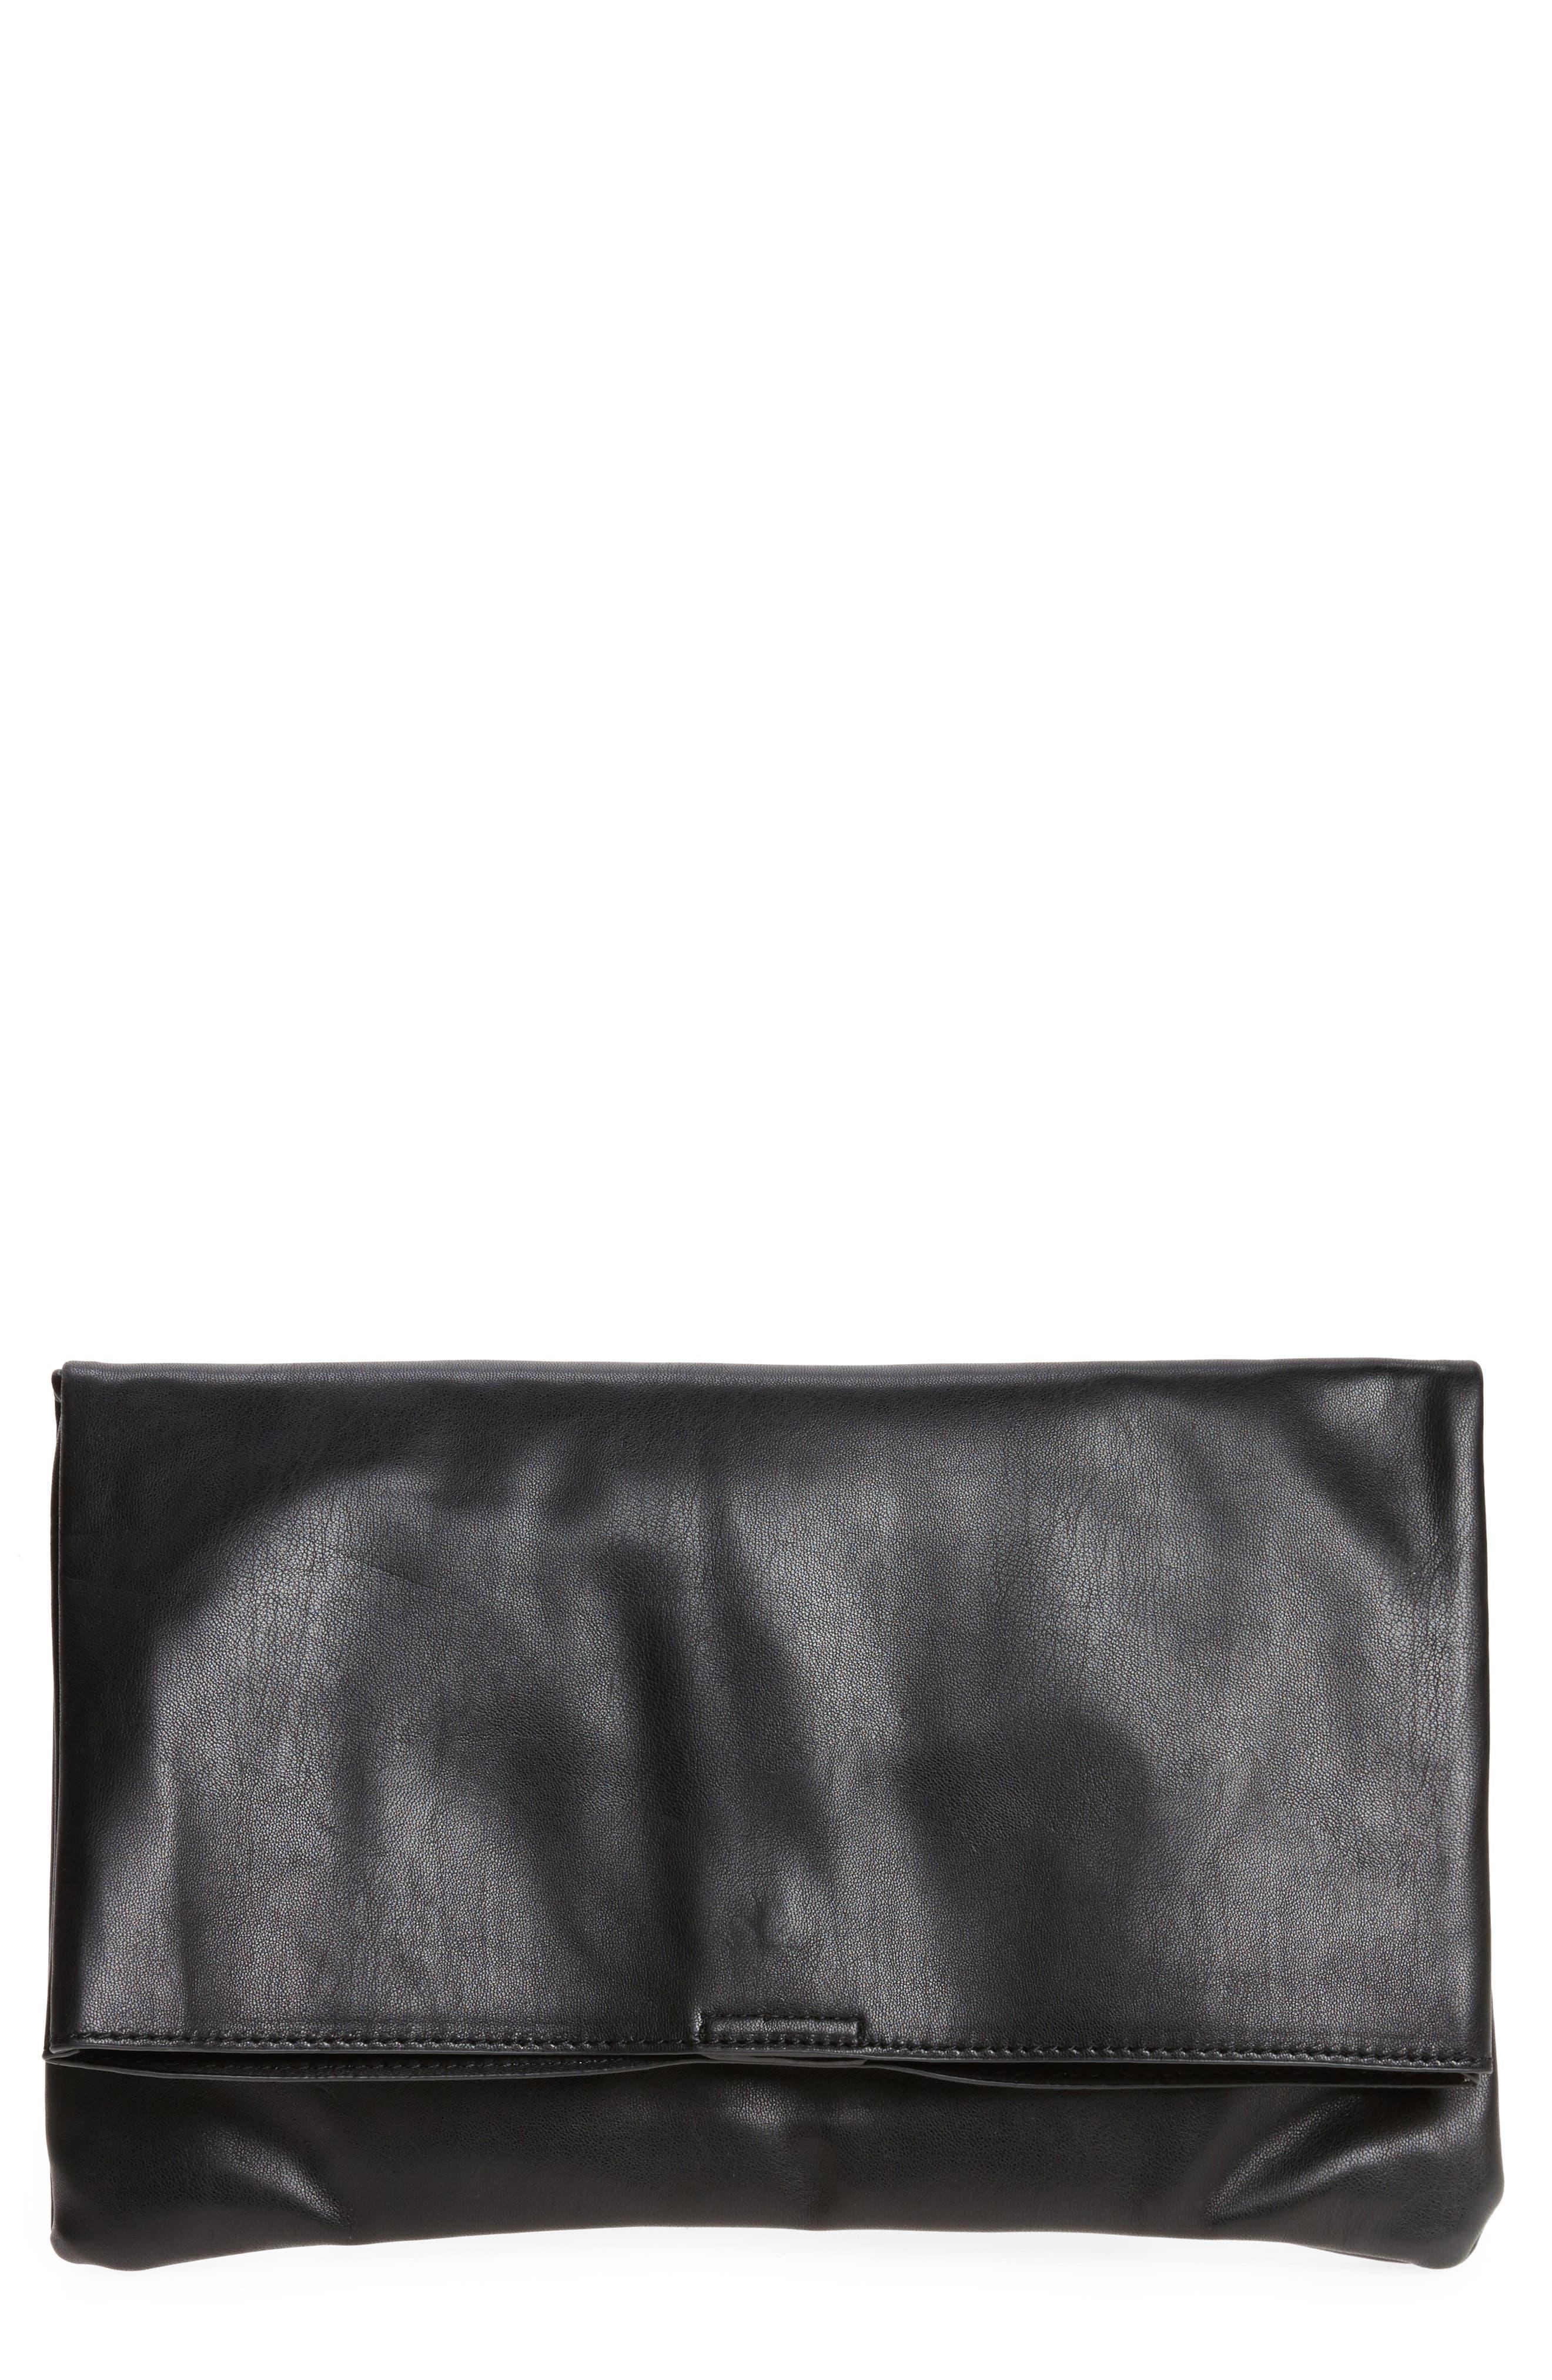 Melrose Faux Leather Clutch,                             Main thumbnail 1, color,                             001